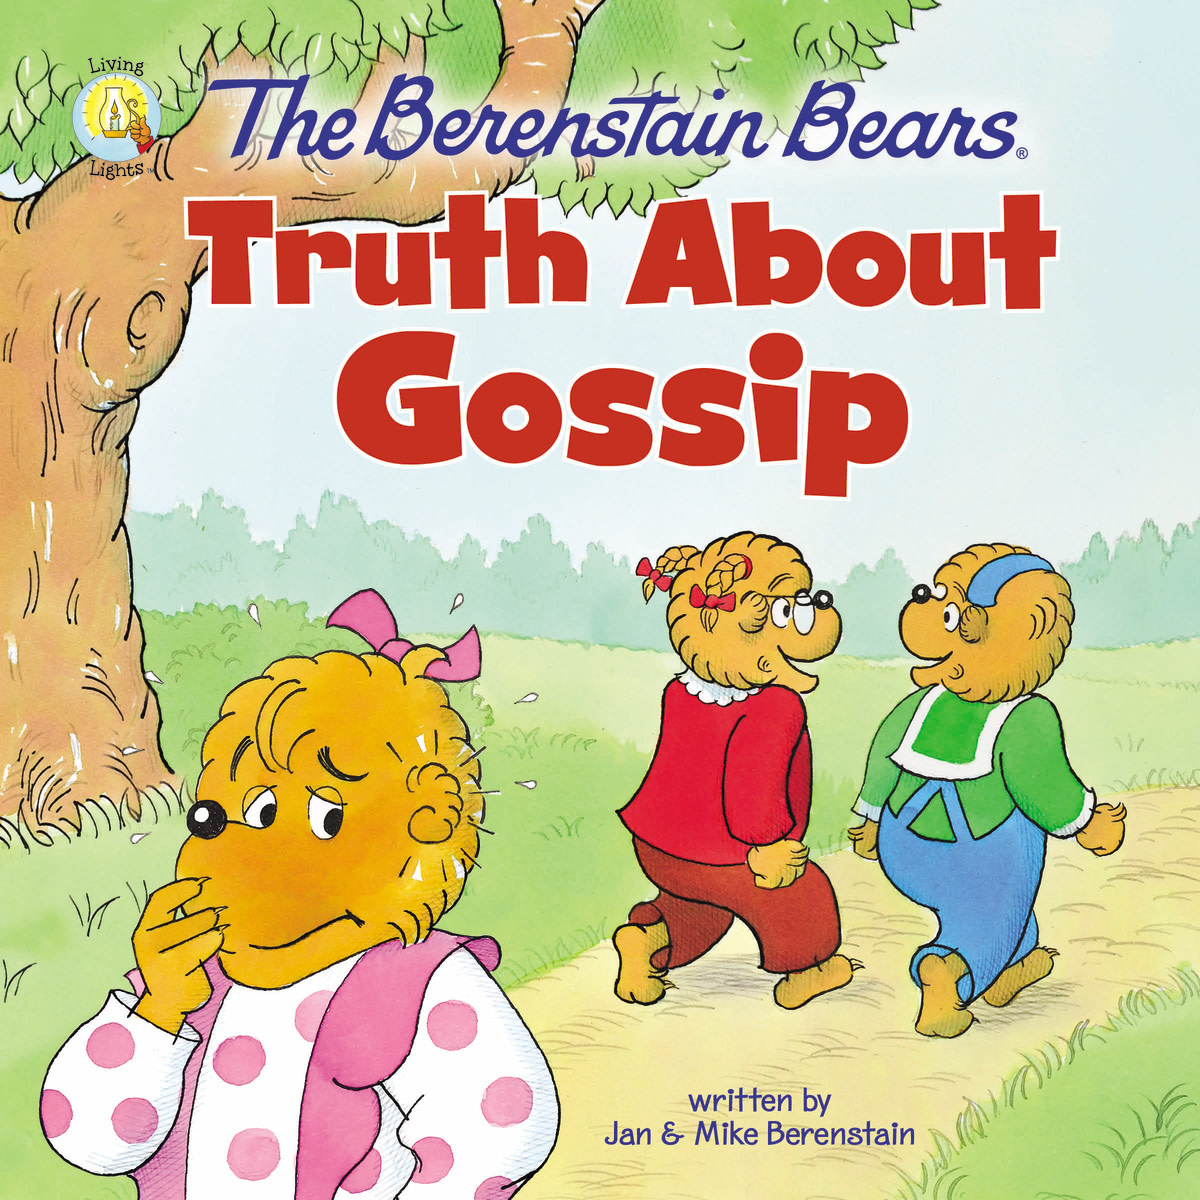 JAN BERENSTAIN The Berenstain Bears Truth About Gossip